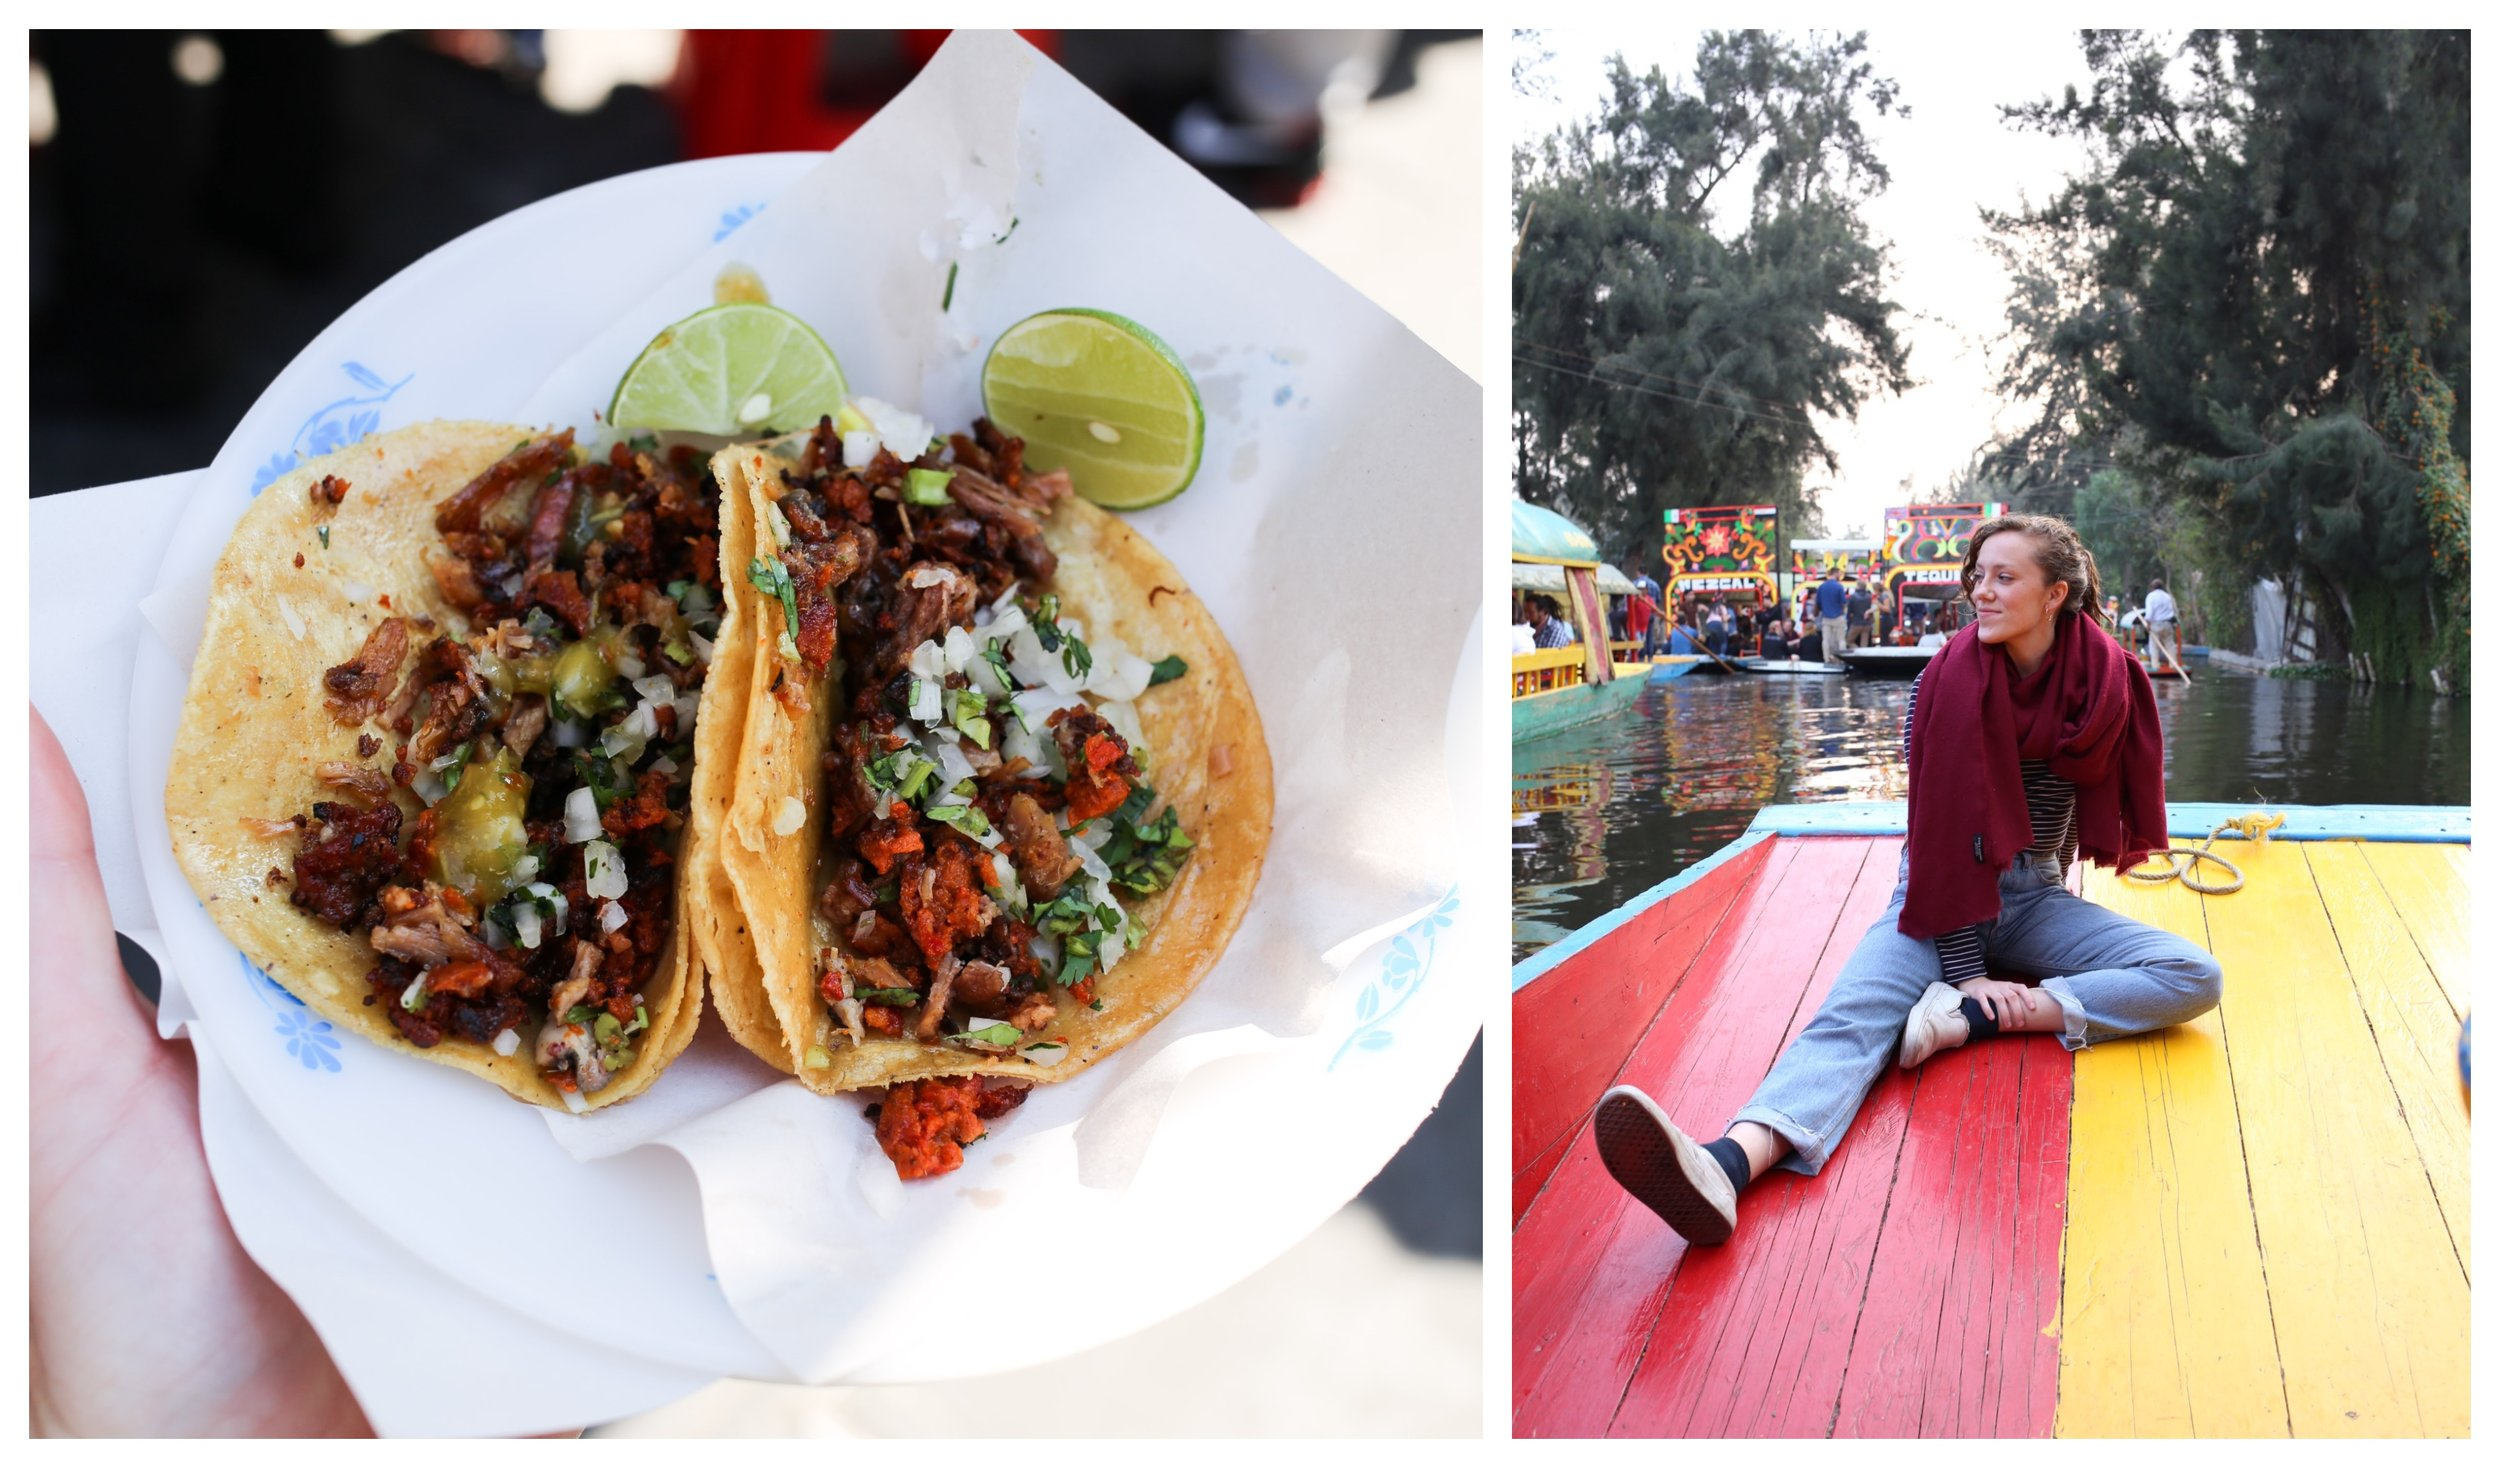 Tacos el pastor in Mexico City (left) Xochimilco boat cruise (right)